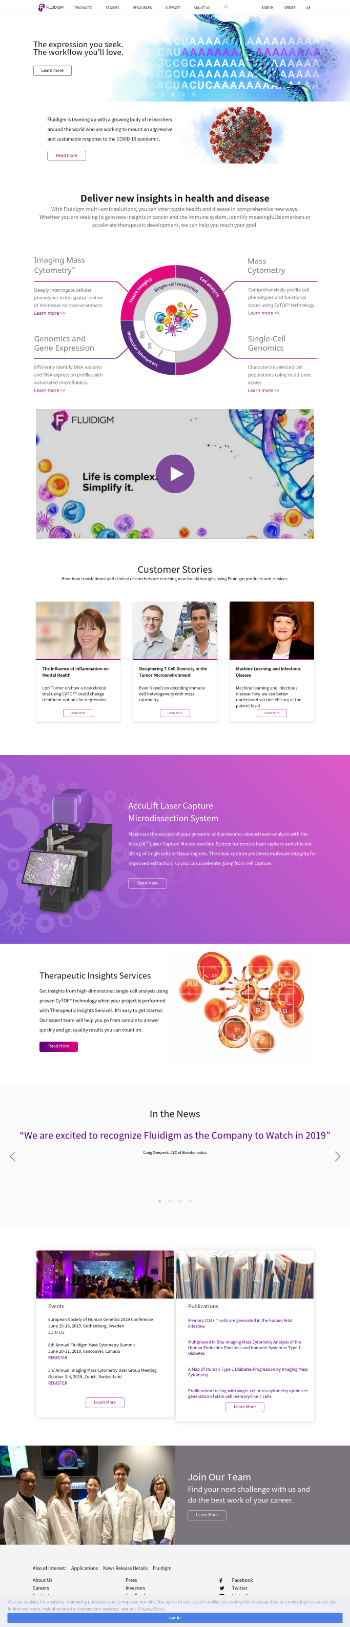 Fluidigm Corporation Website Screenshot